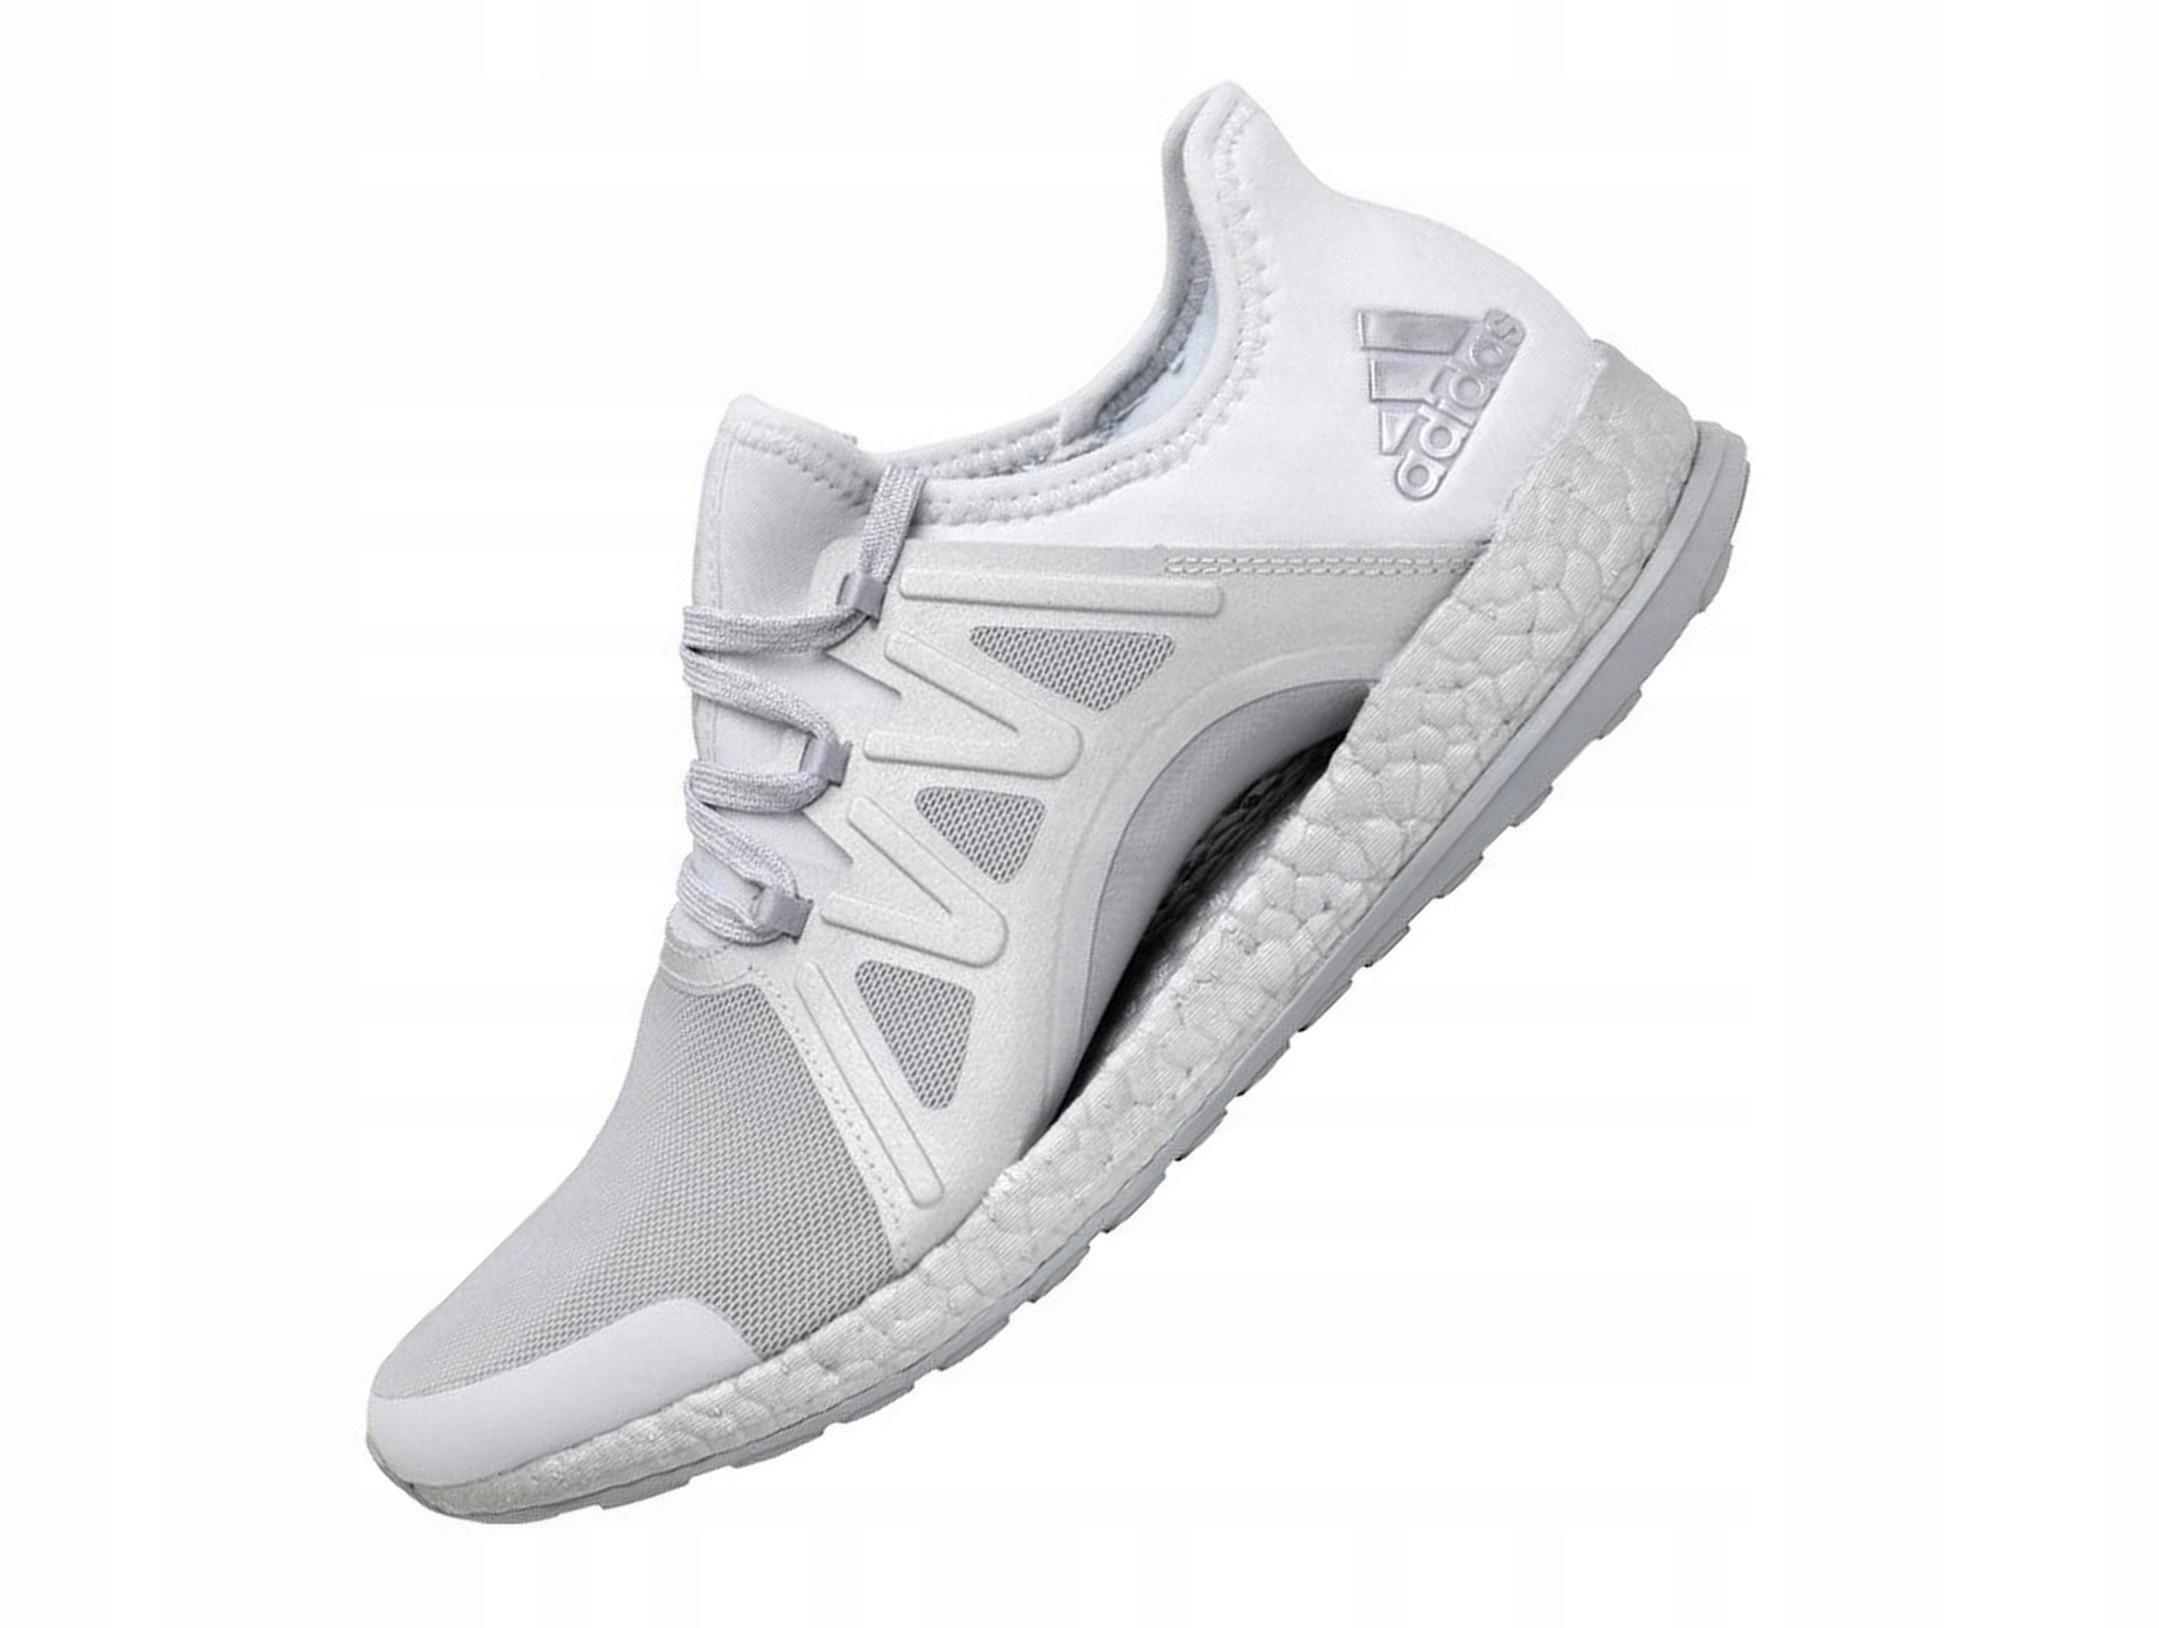 7d87f7dafc390 Buty Damskie Adidas PureBoost Expose Białe 36,7 - 7416152583 ...